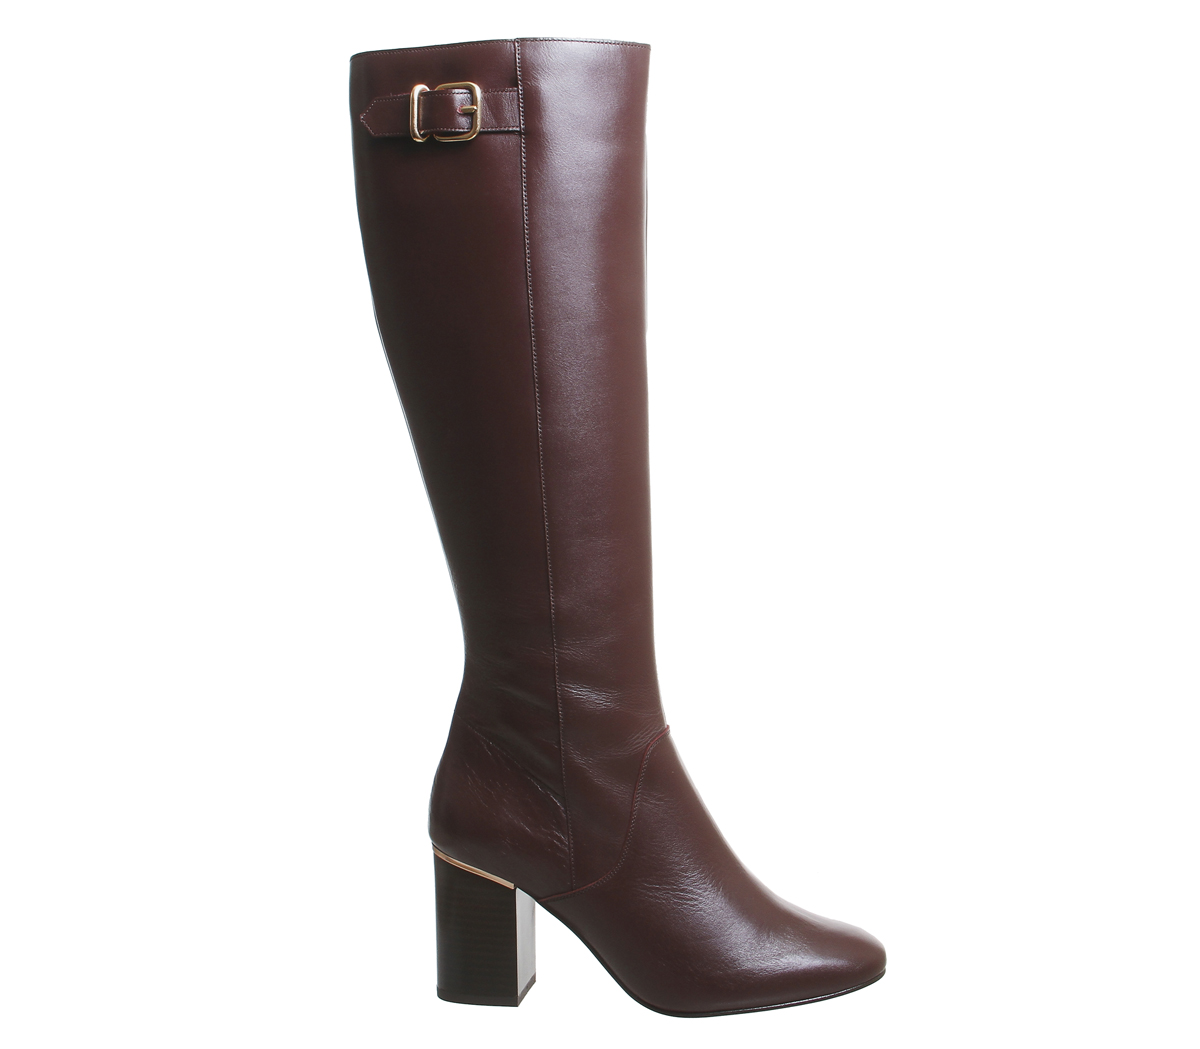 Damens Office Keepers Stiefel Smart Block Heel Knee Stiefel Keepers BURGUNDY LEATHER Stiefel 1ebdc3